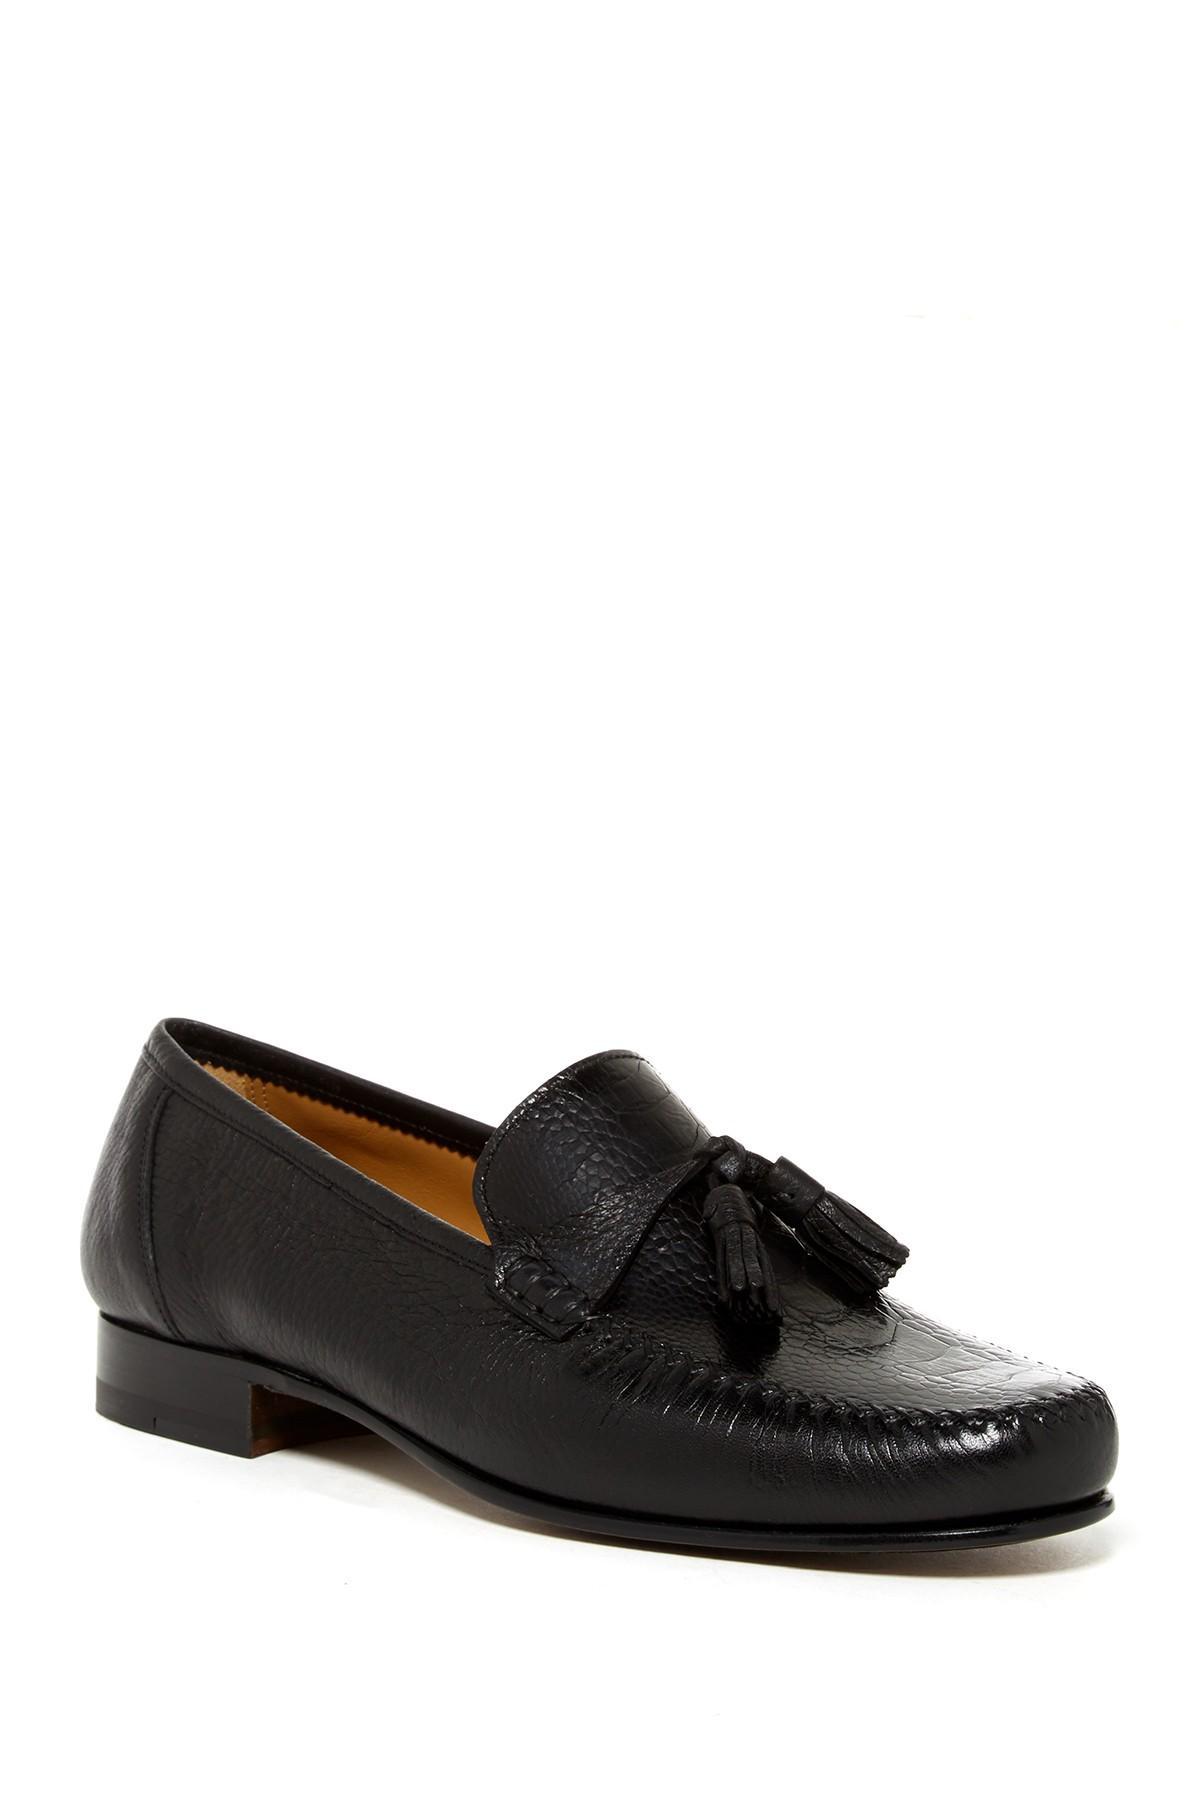 saks fifth avenue selo ostrich loafer in black lyst